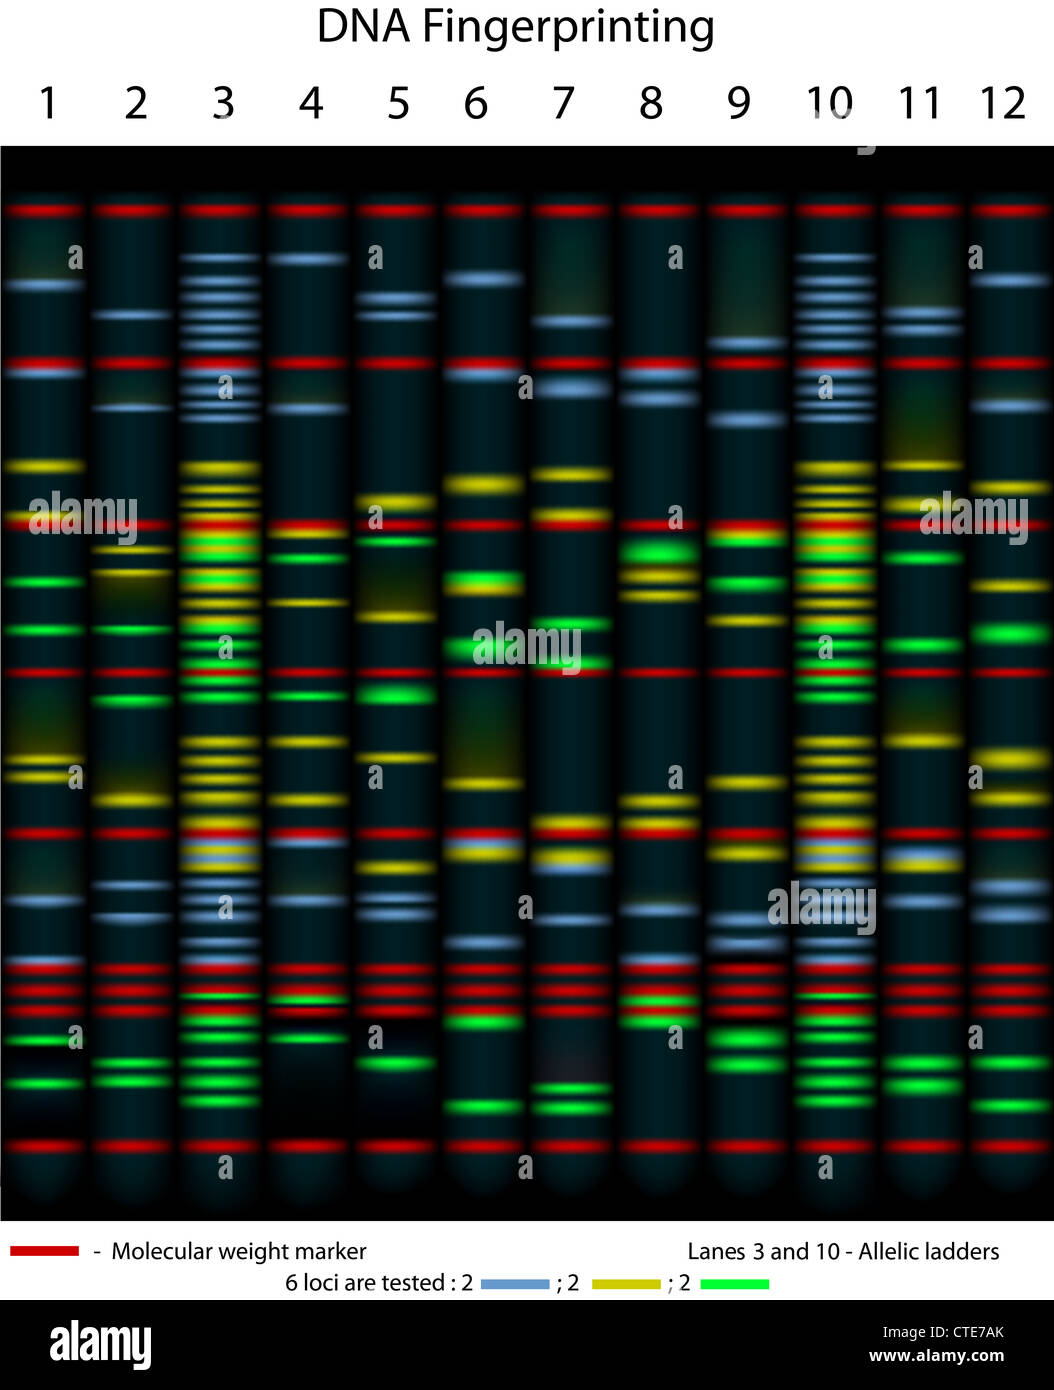 El fingerprinting del ADN ejemplo gel Imagen De Stock